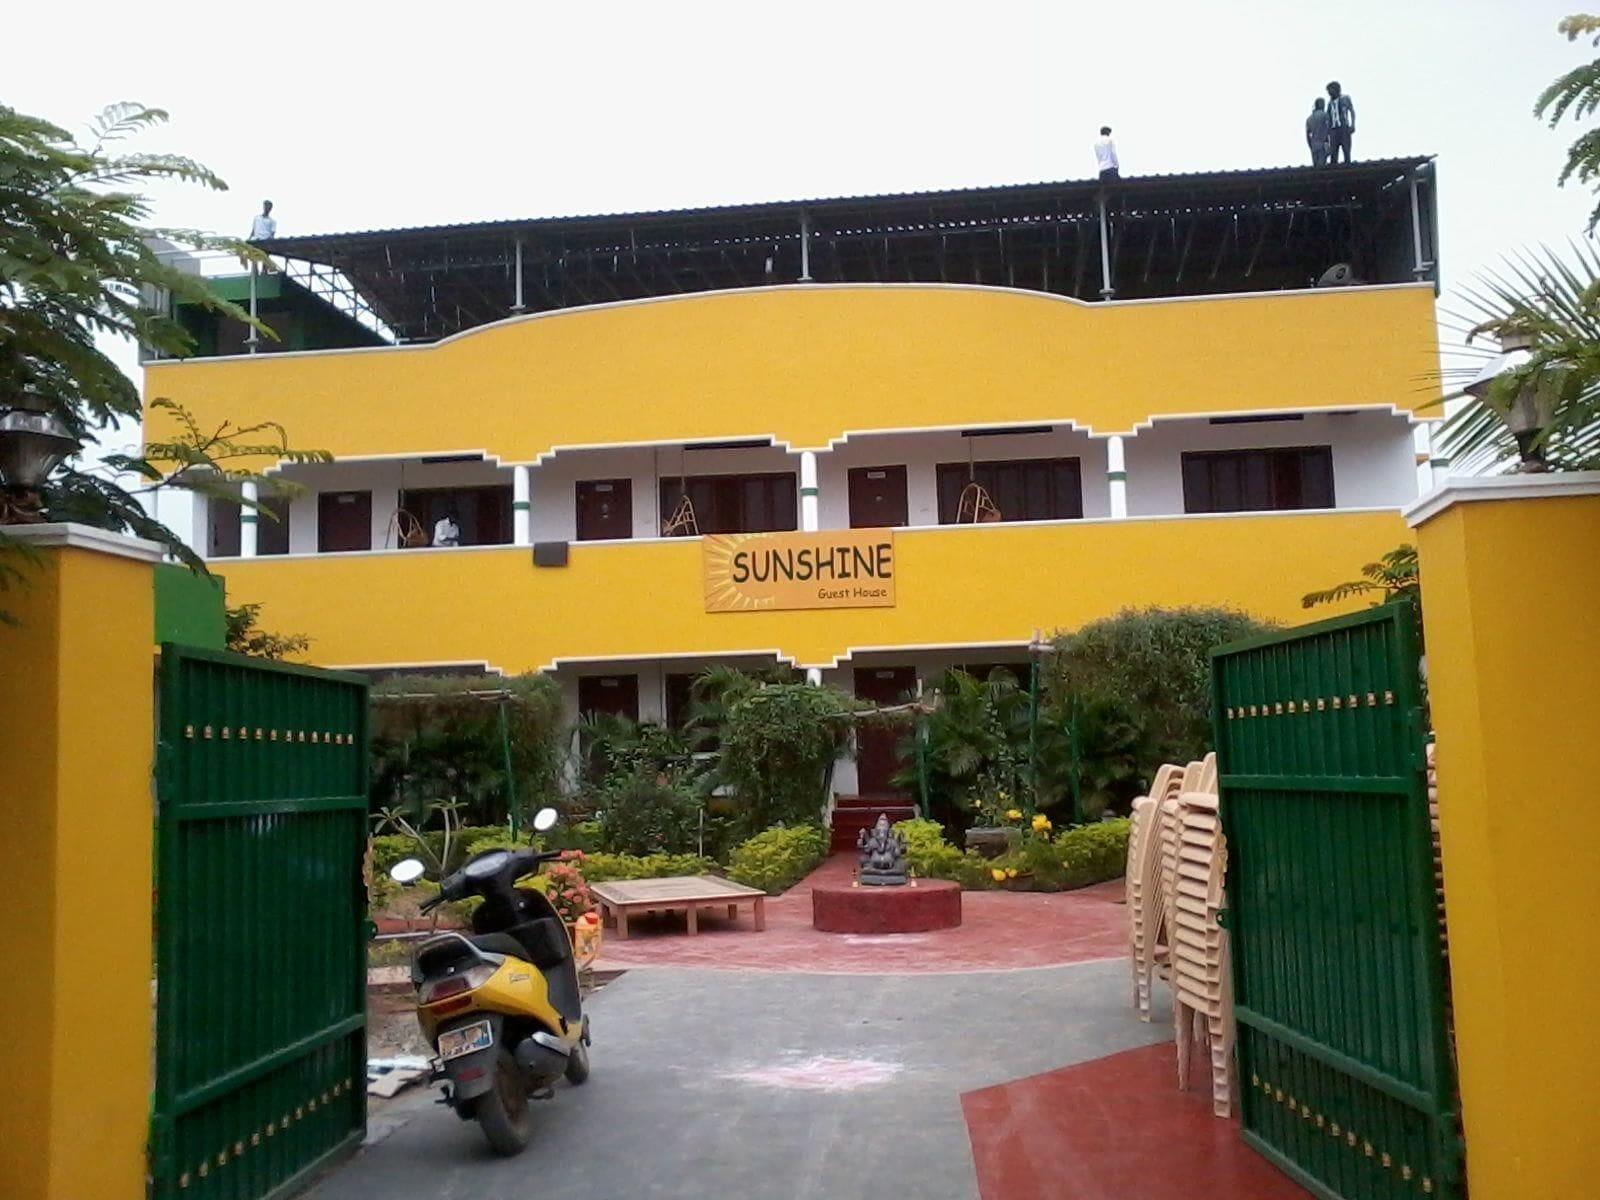 Sunshine Guest House, Tiruvannamalai